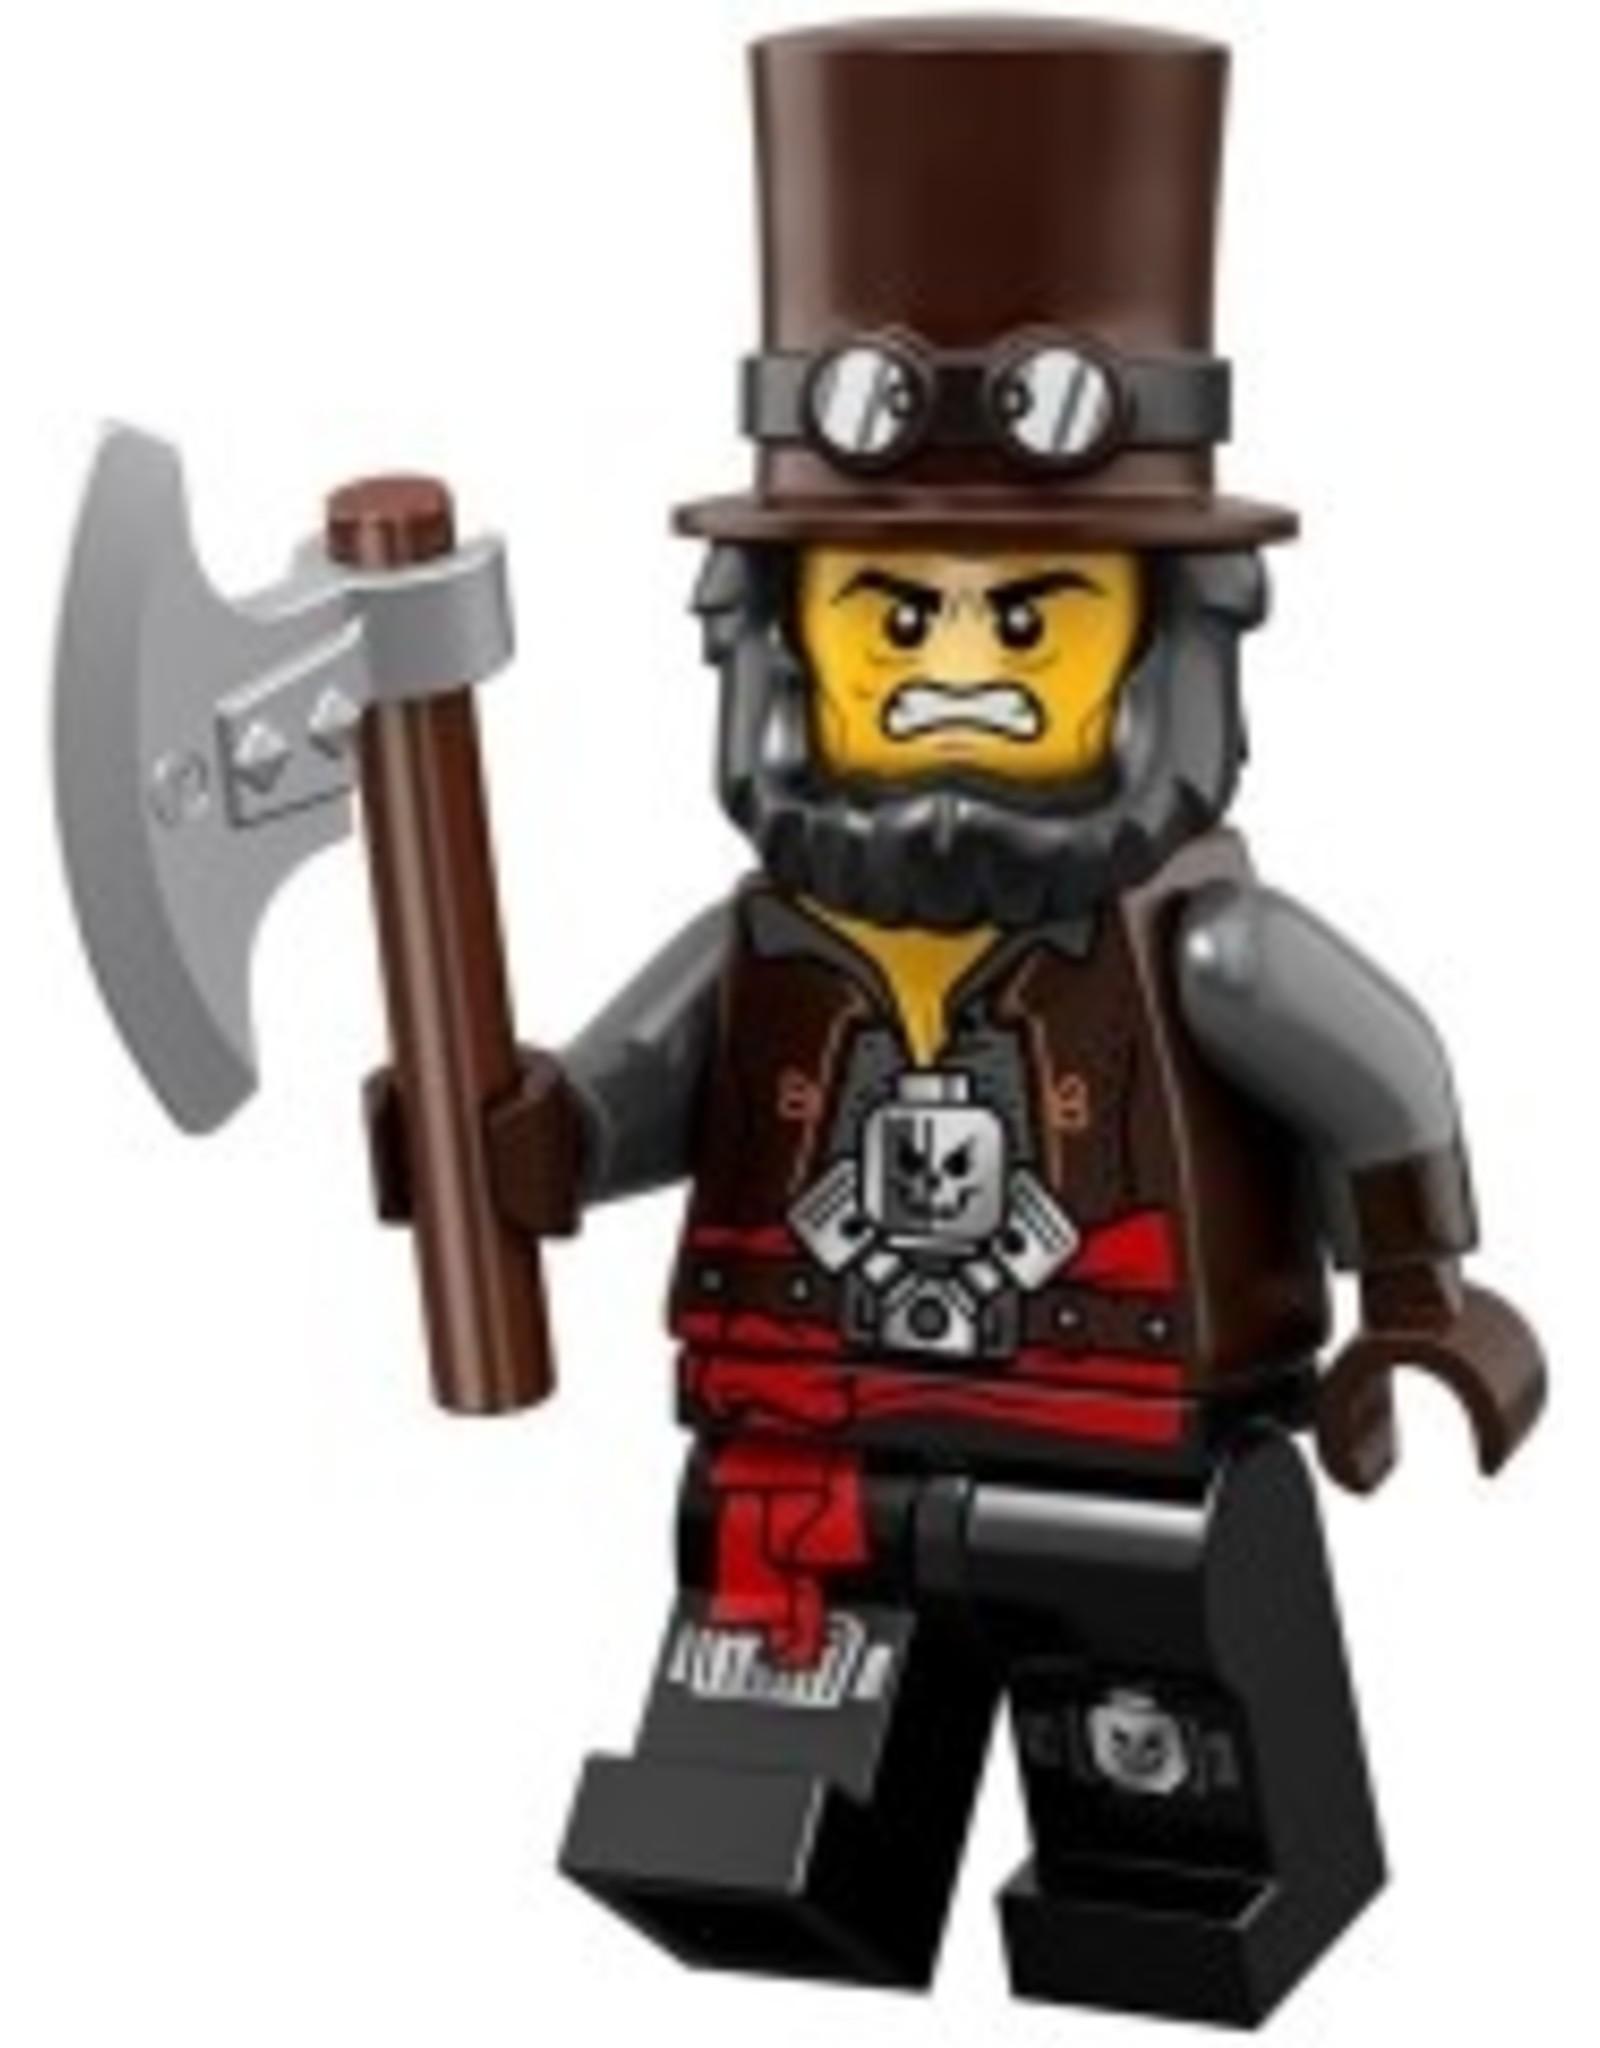 LEGO LEGO Minifigures The lego movie 2 - Apocalypsstad Abe 13/20 - 71023